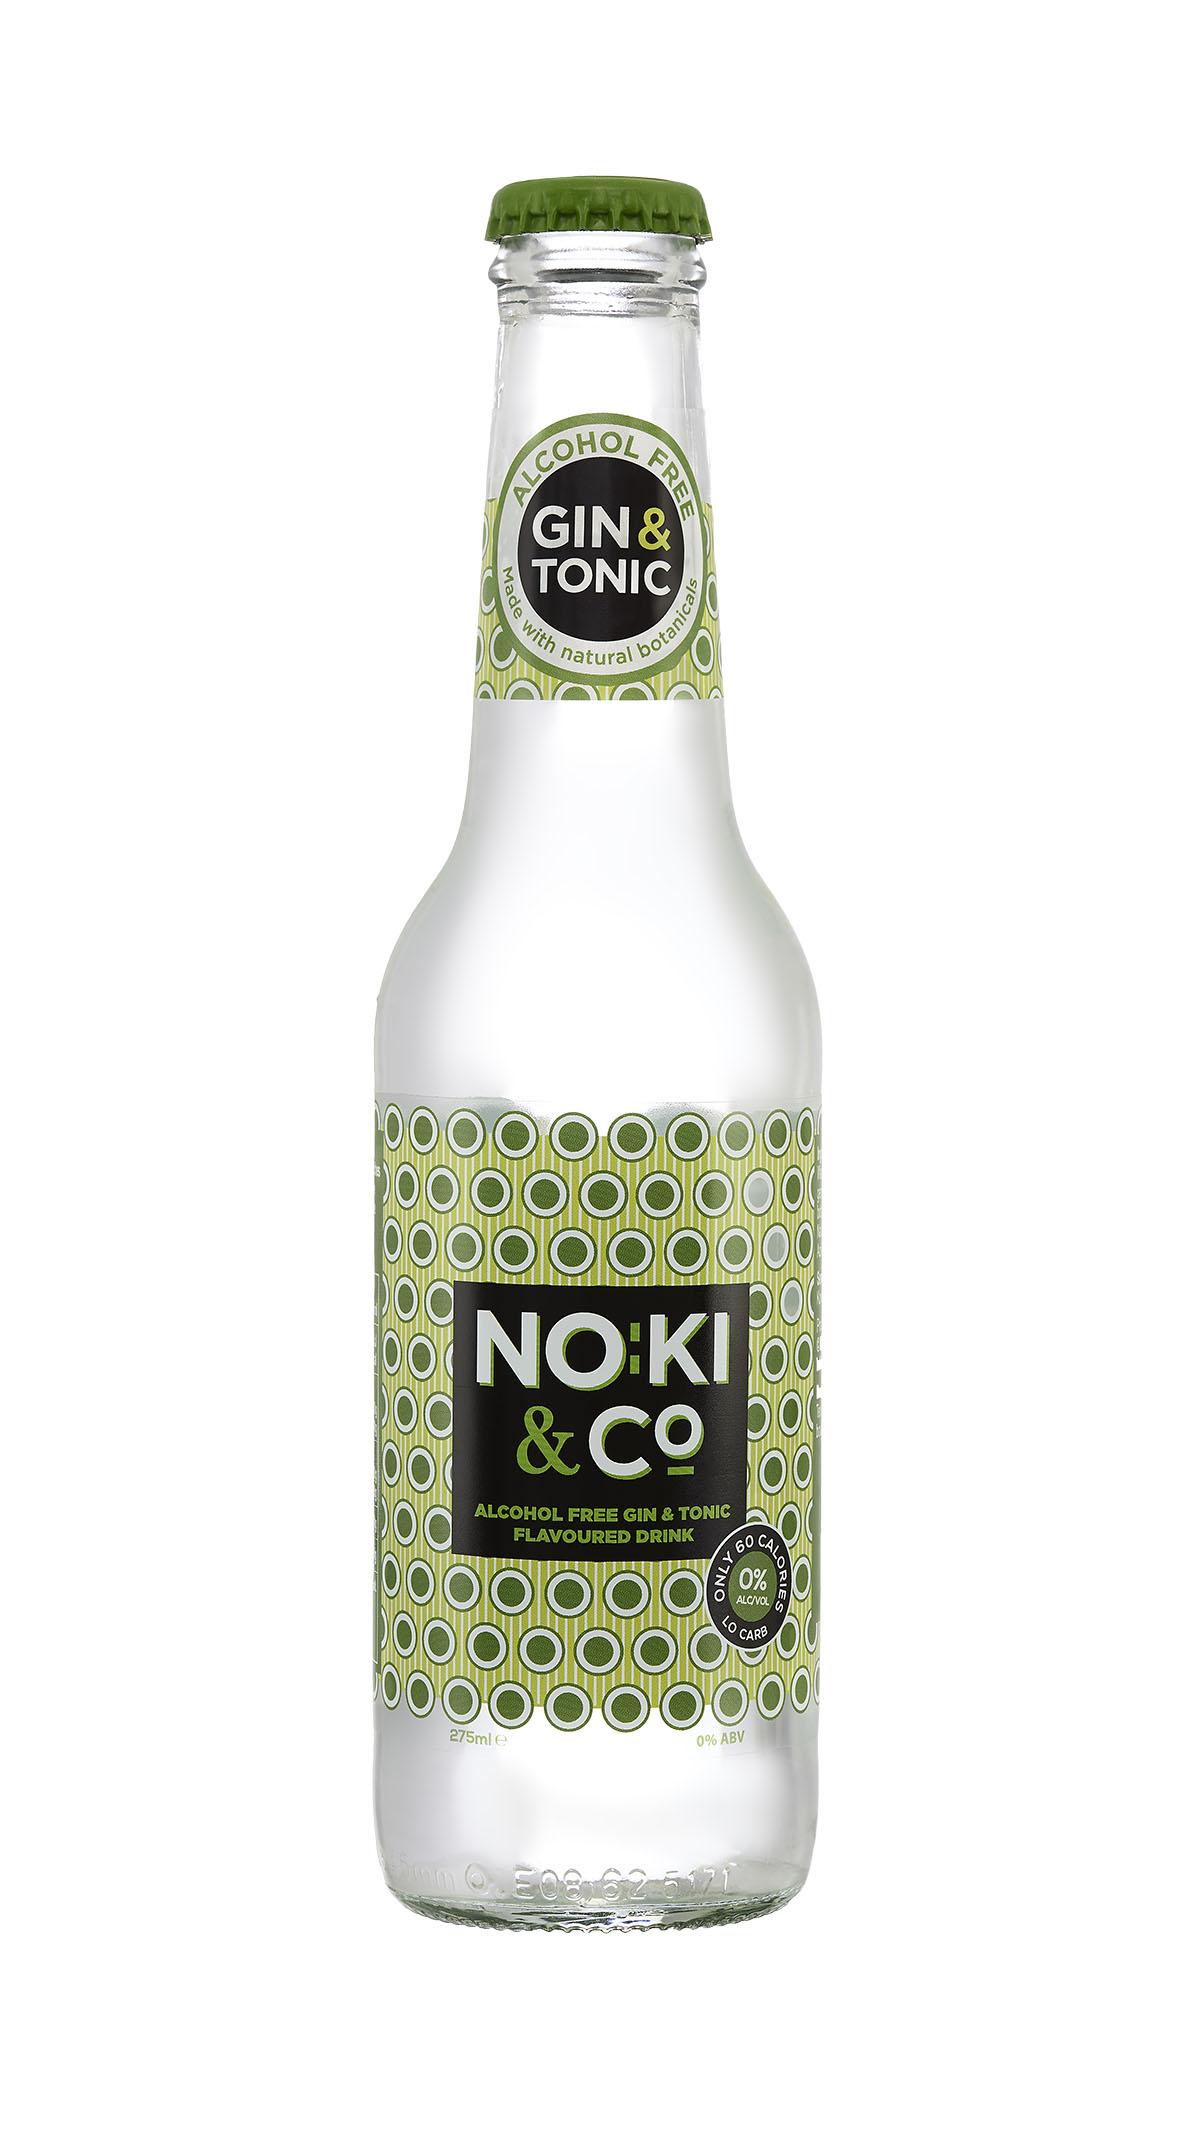 NOKI - Drinks Label Design Dublin